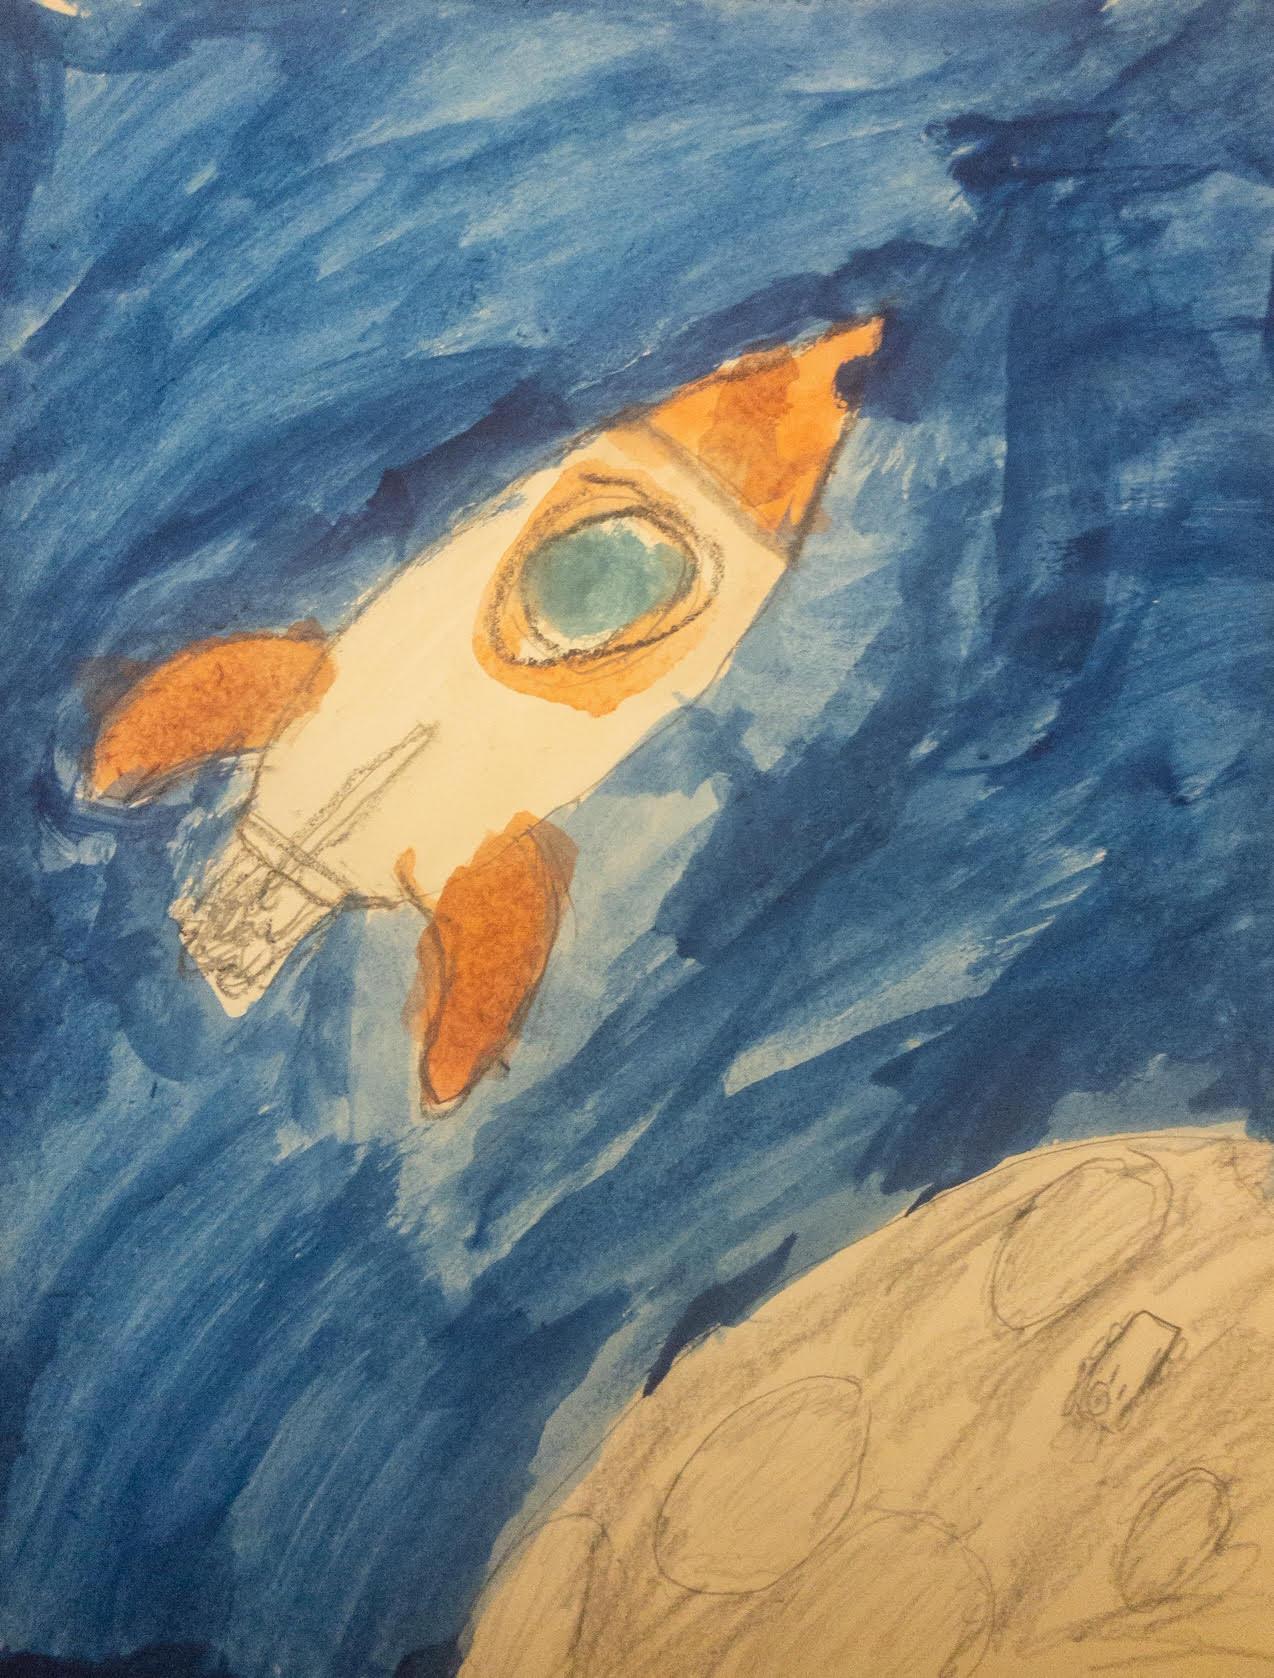 Space Art 2